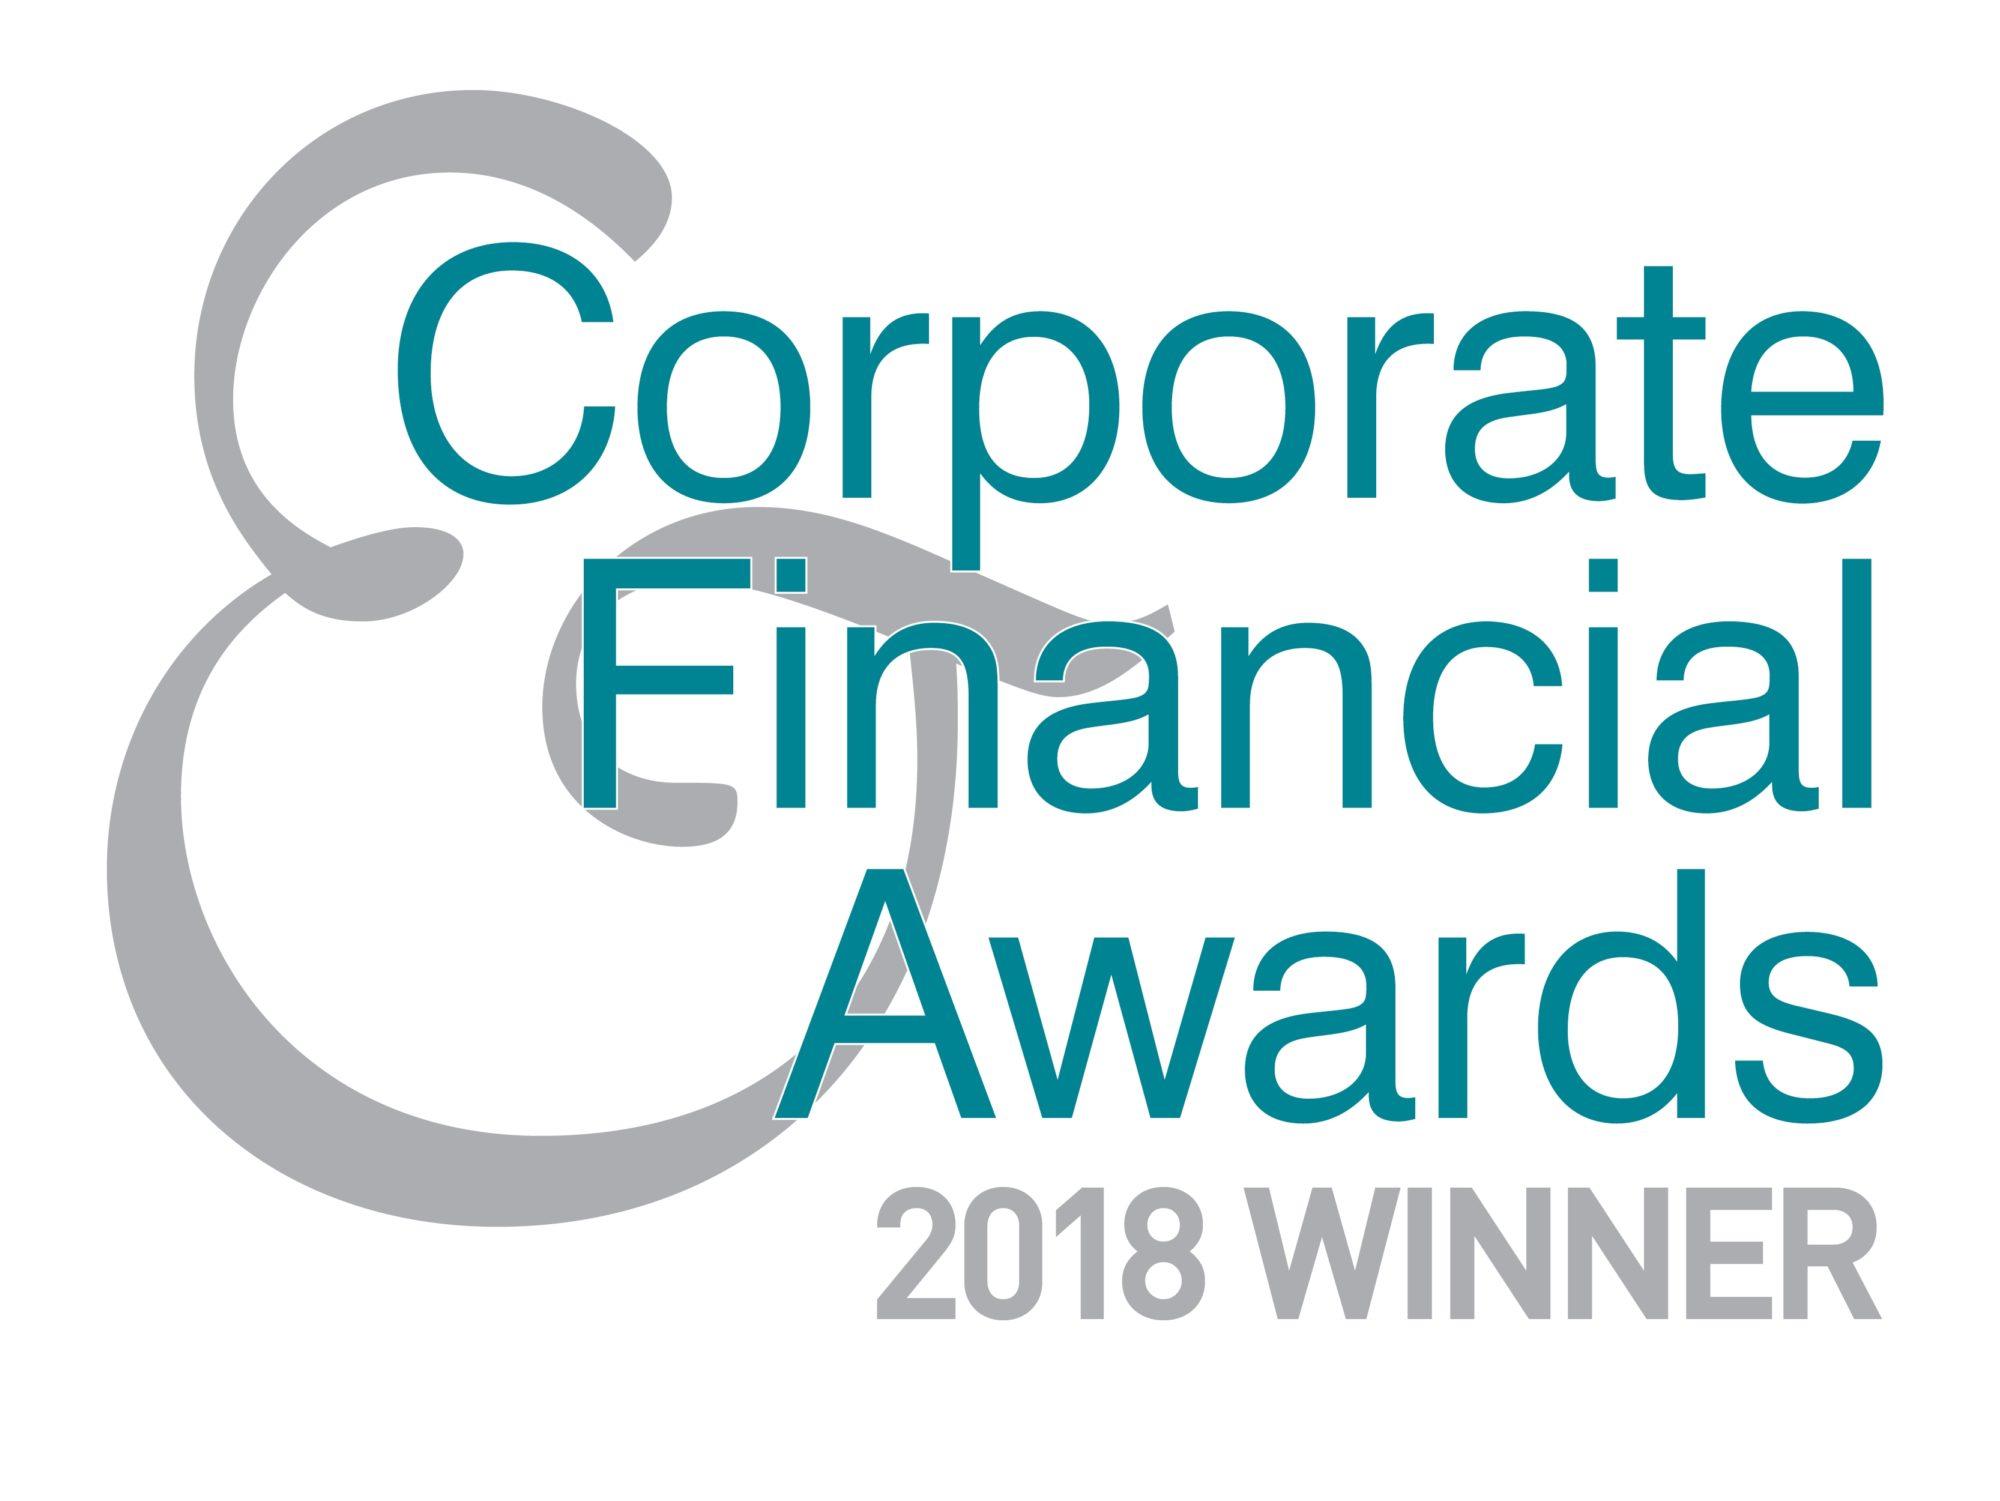 Corporate & Financial Awards 2018